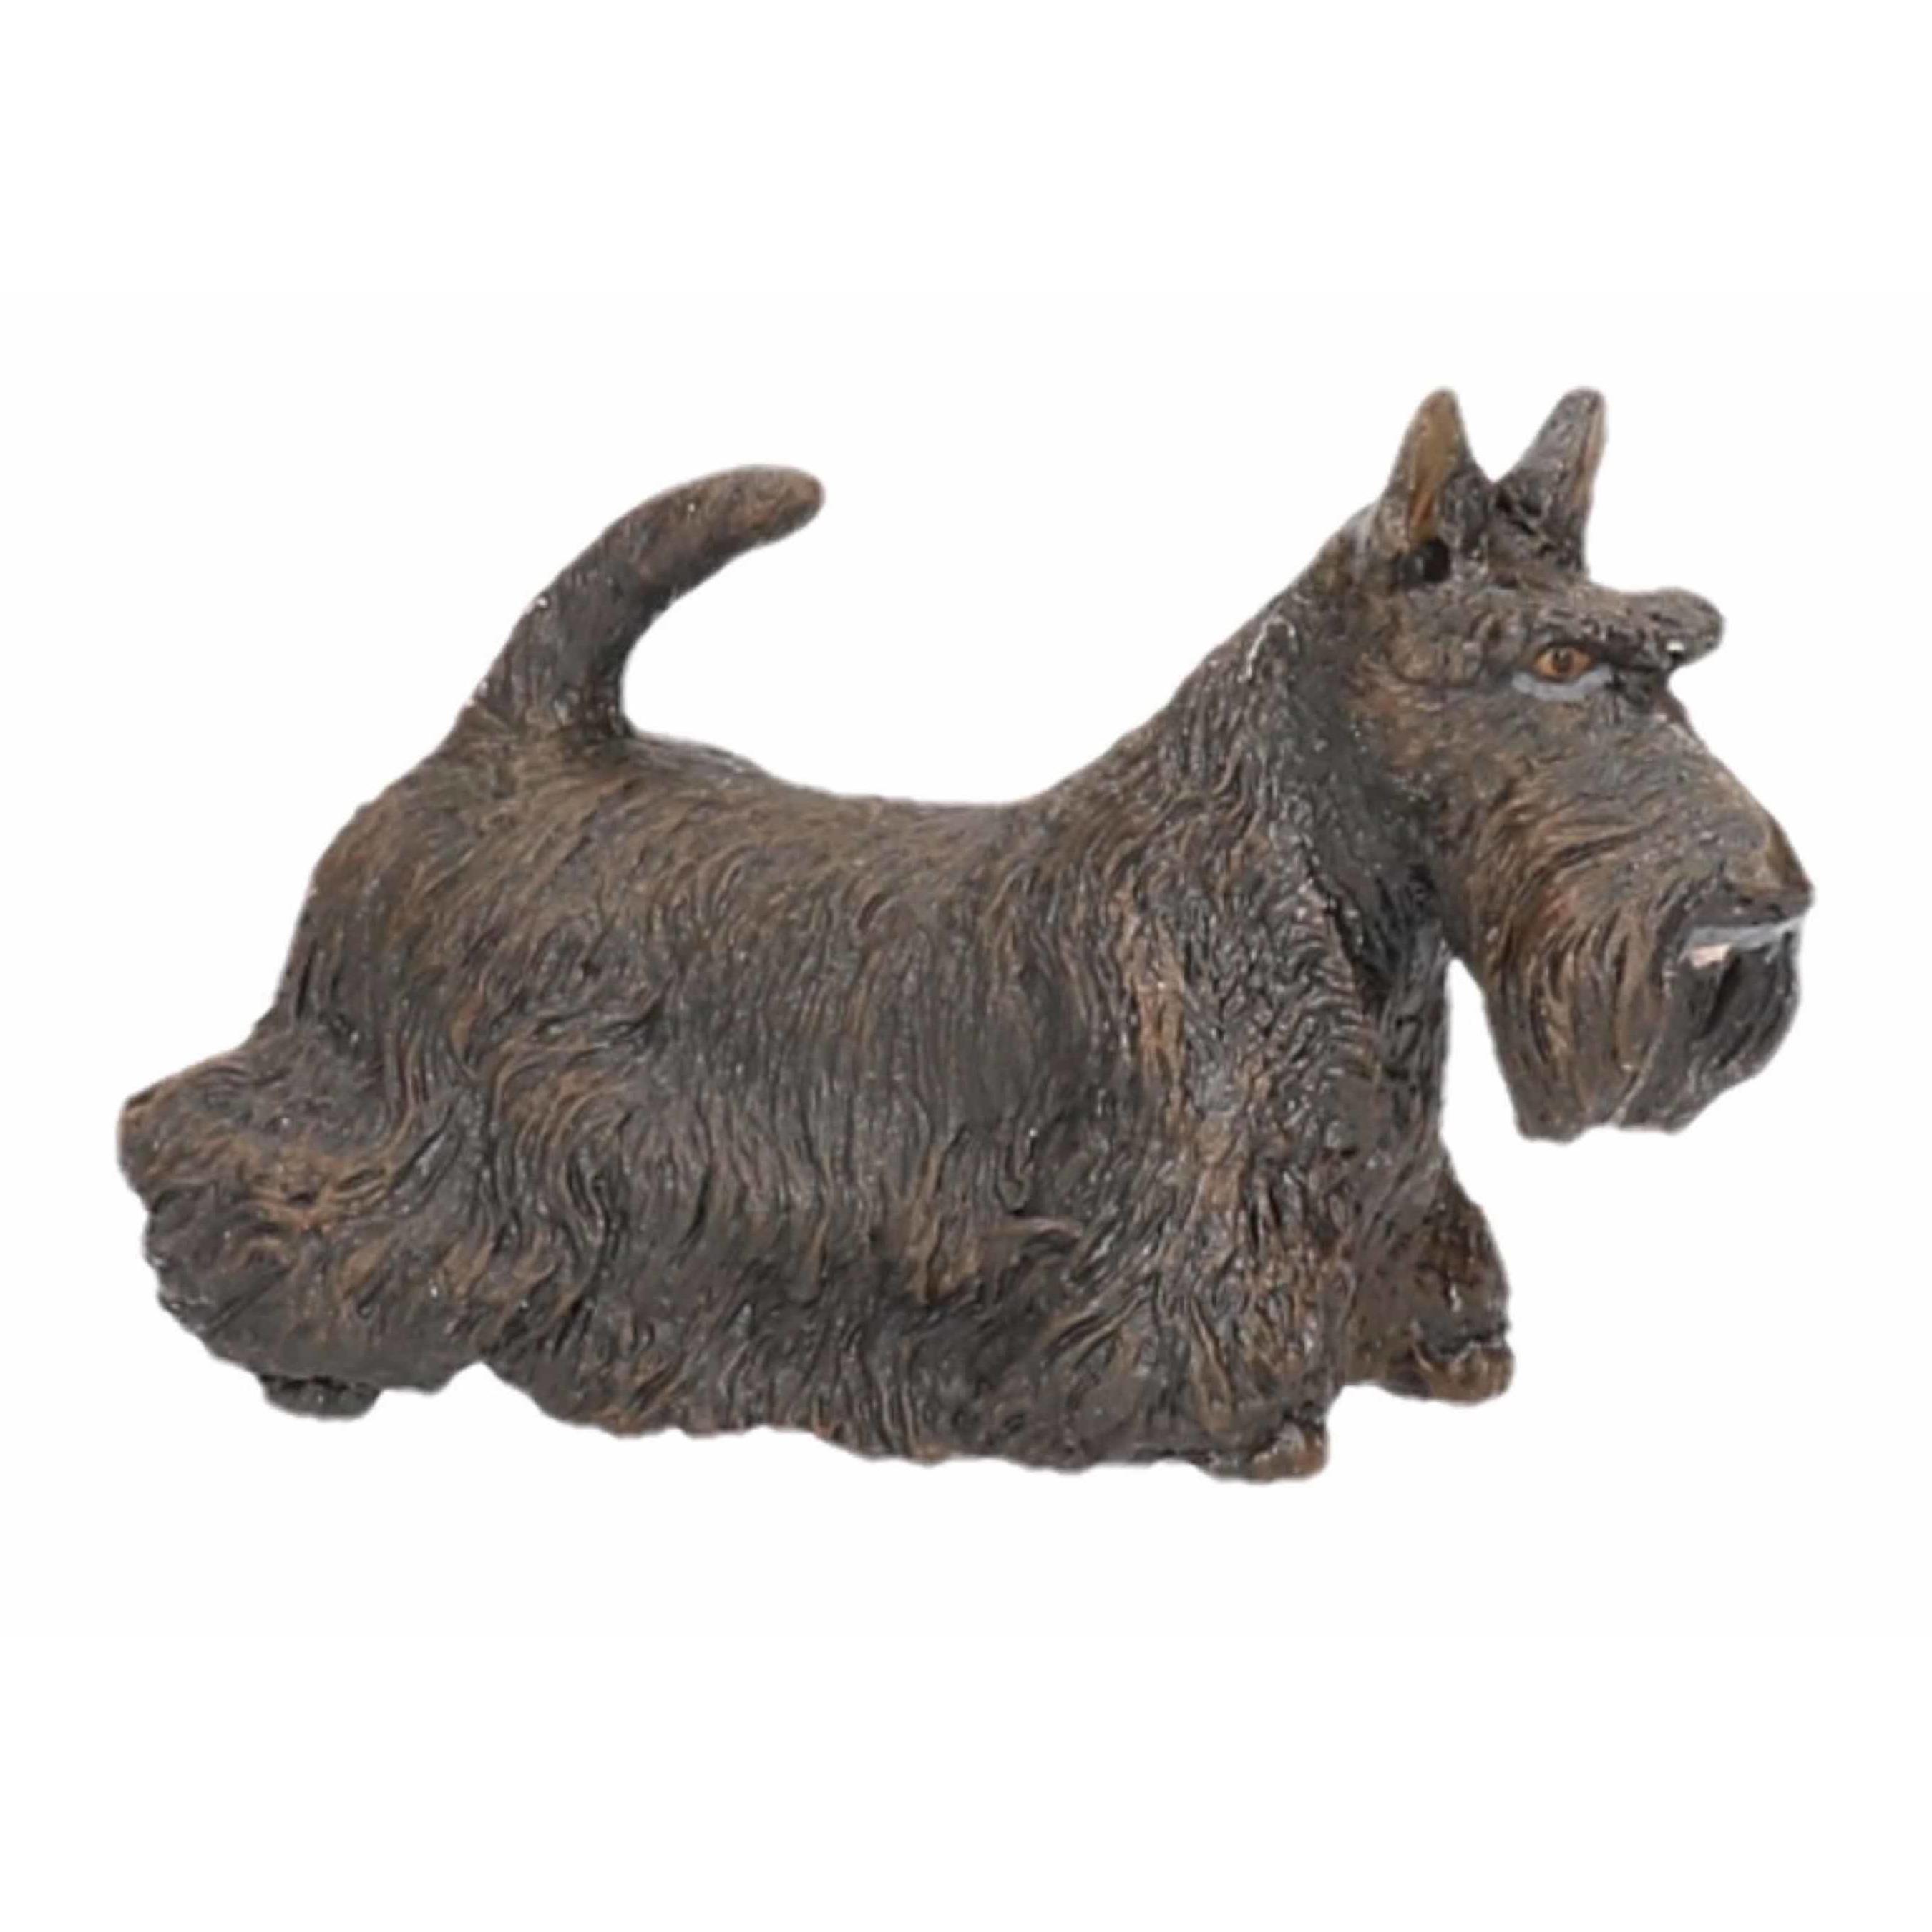 Speeldiertje zwarte Schotse hond